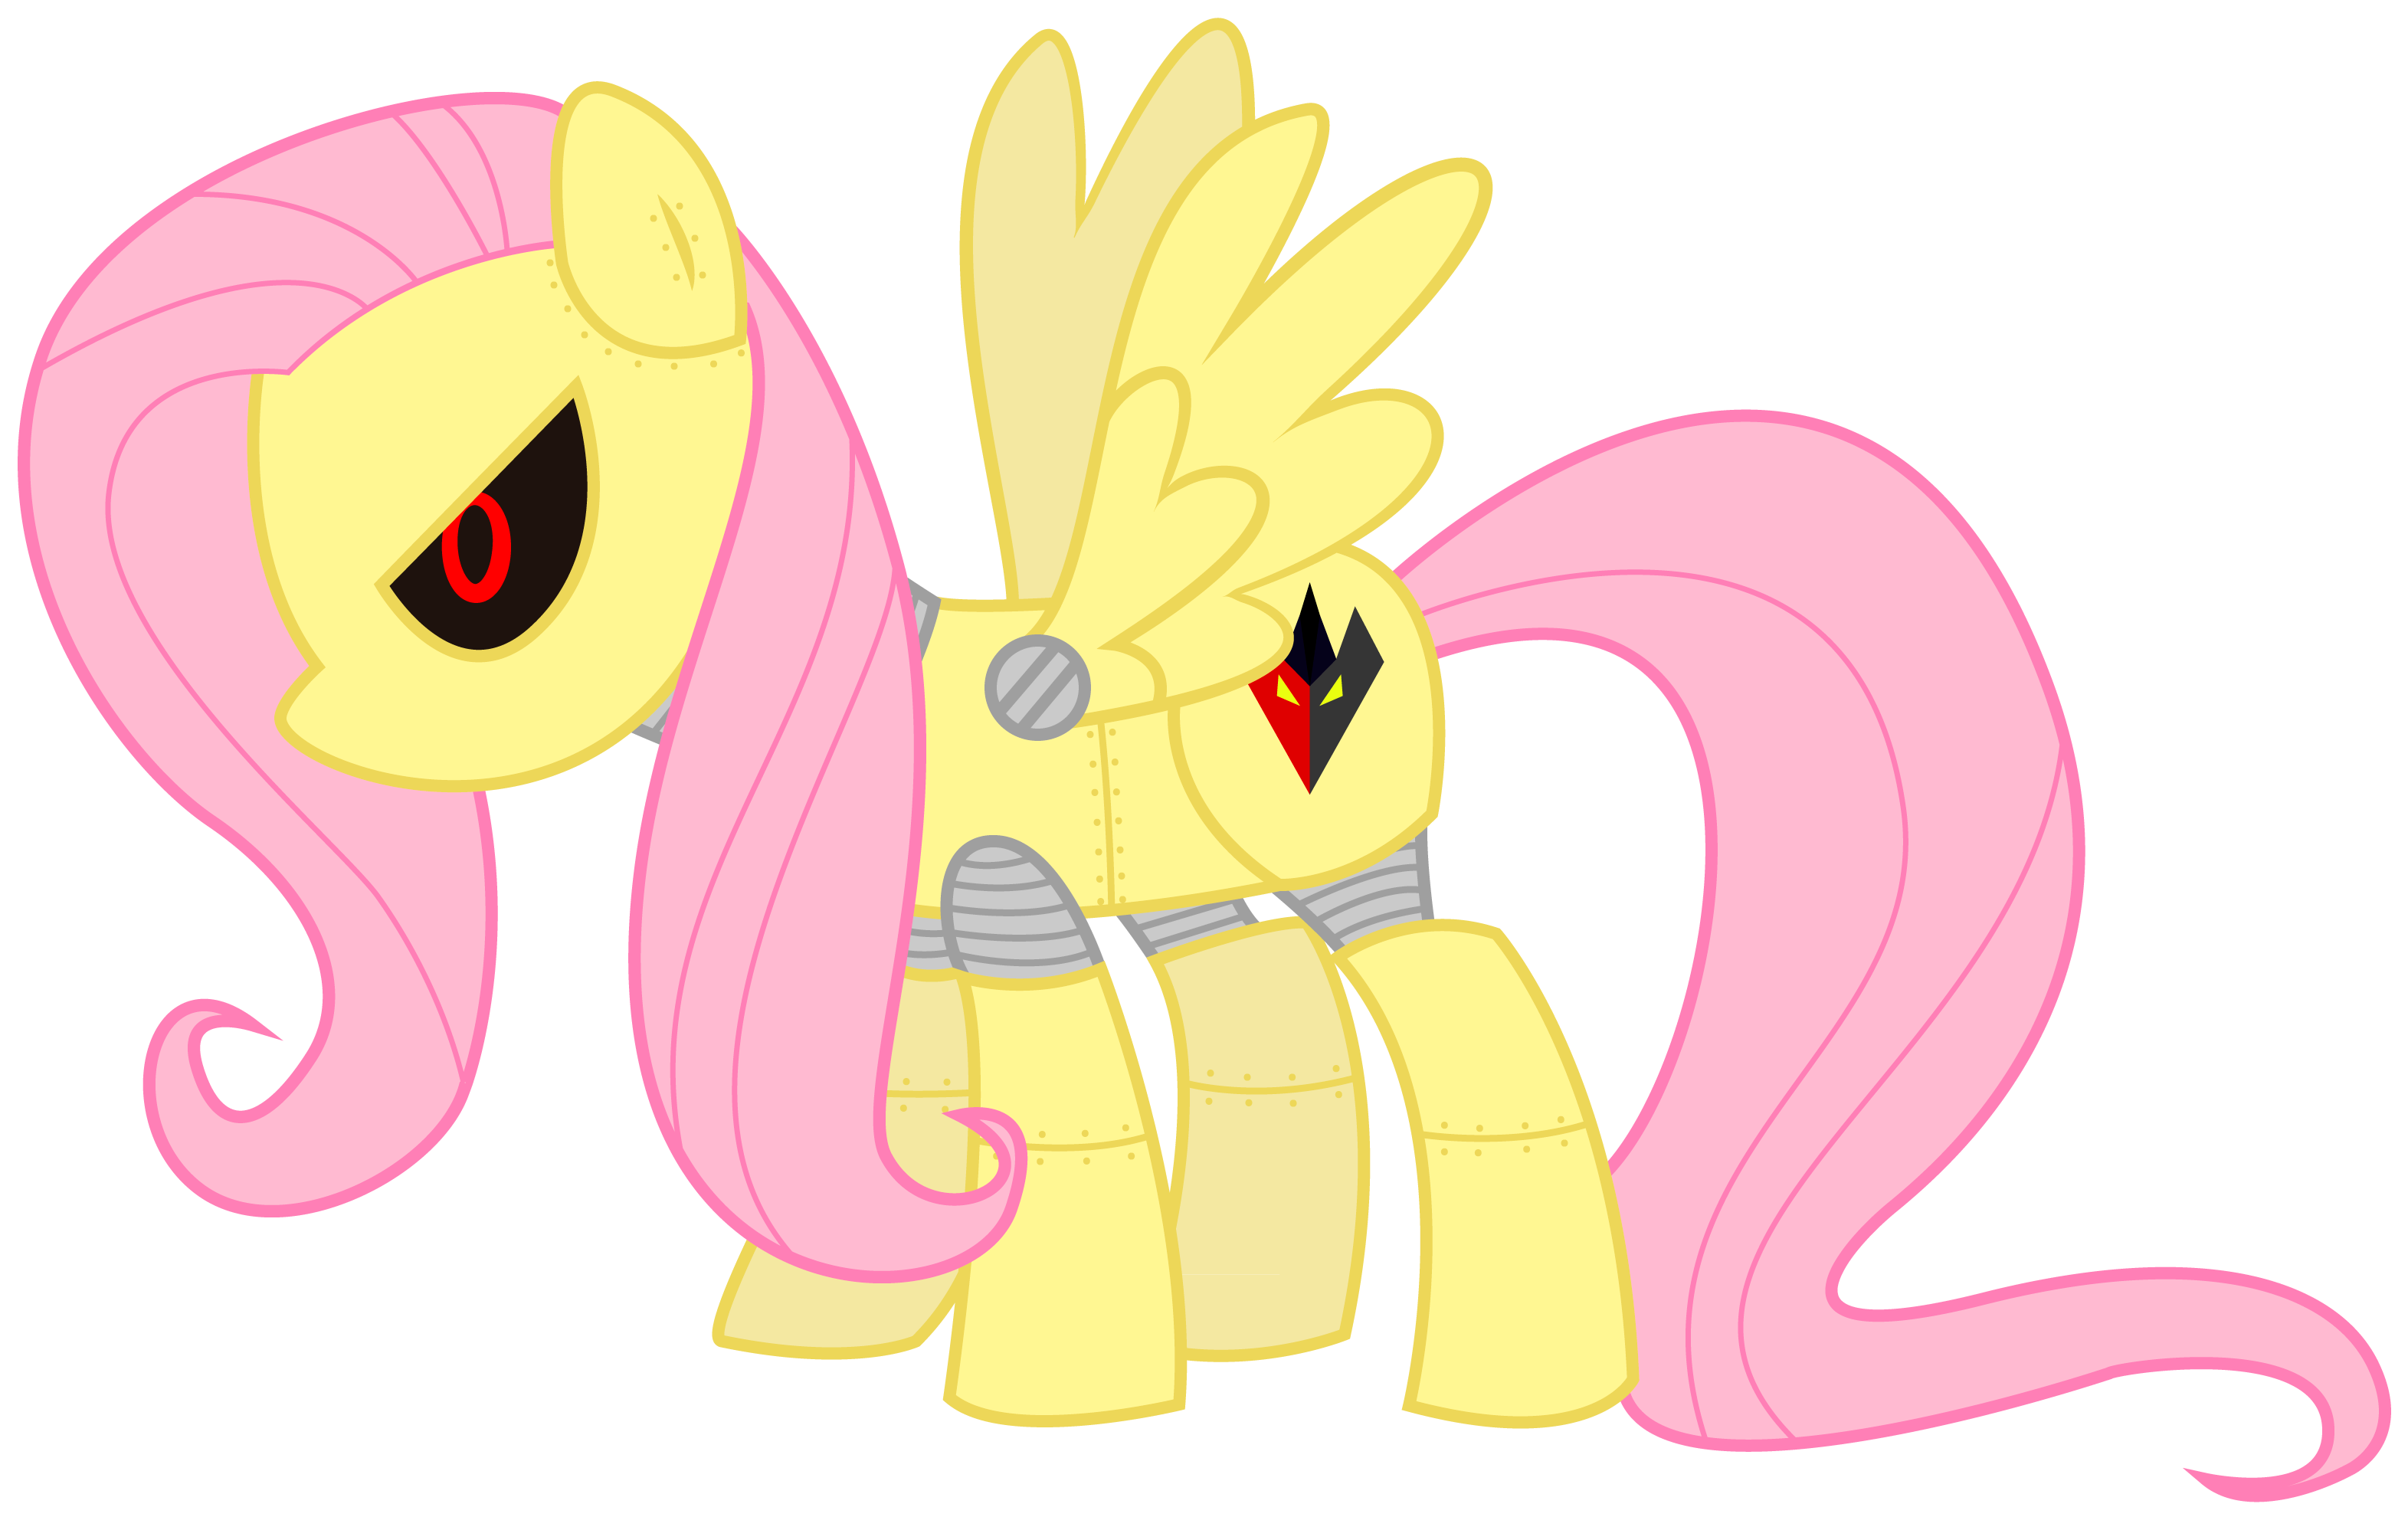 Mecha Fluttershy My Little Pony Friendship is Magic